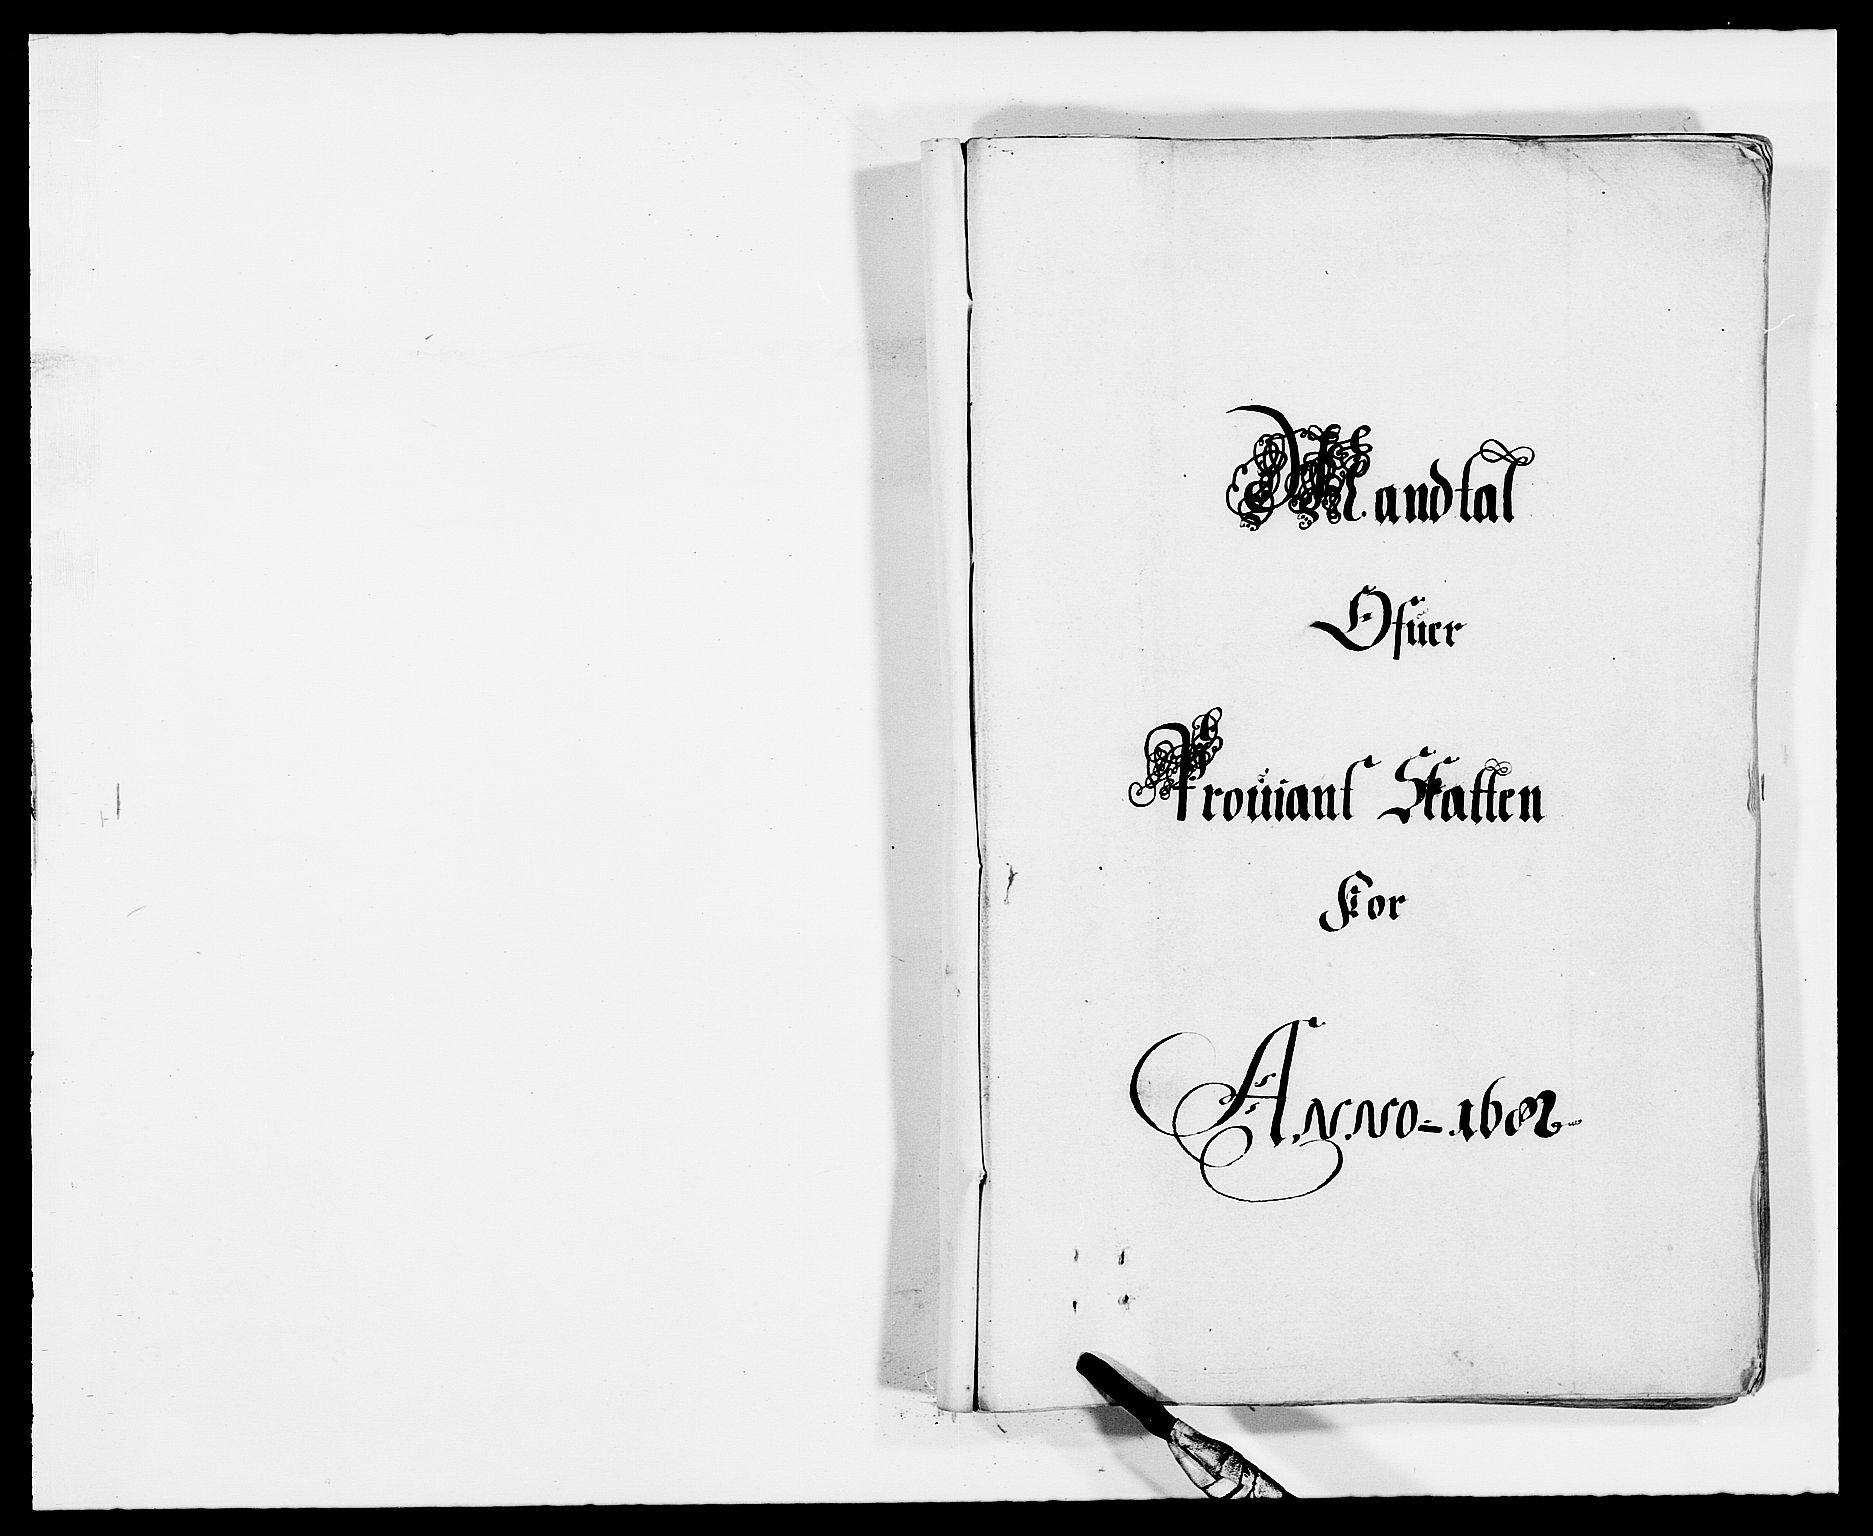 RA, Rentekammeret inntil 1814, Reviderte regnskaper, Fogderegnskap, R32/L1851: Fogderegnskap Jarlsberg grevskap, 1682, s. 139